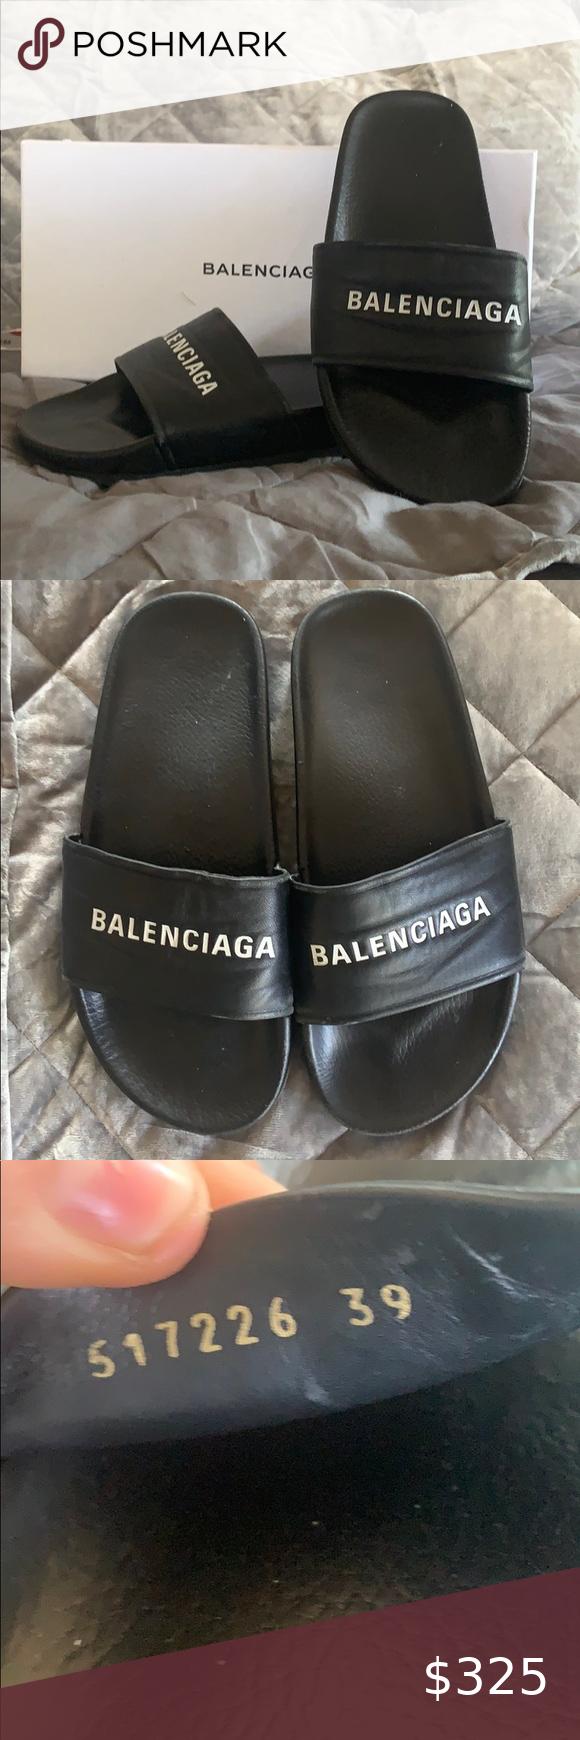 Authentic Balenciaga Leather Pool Slide